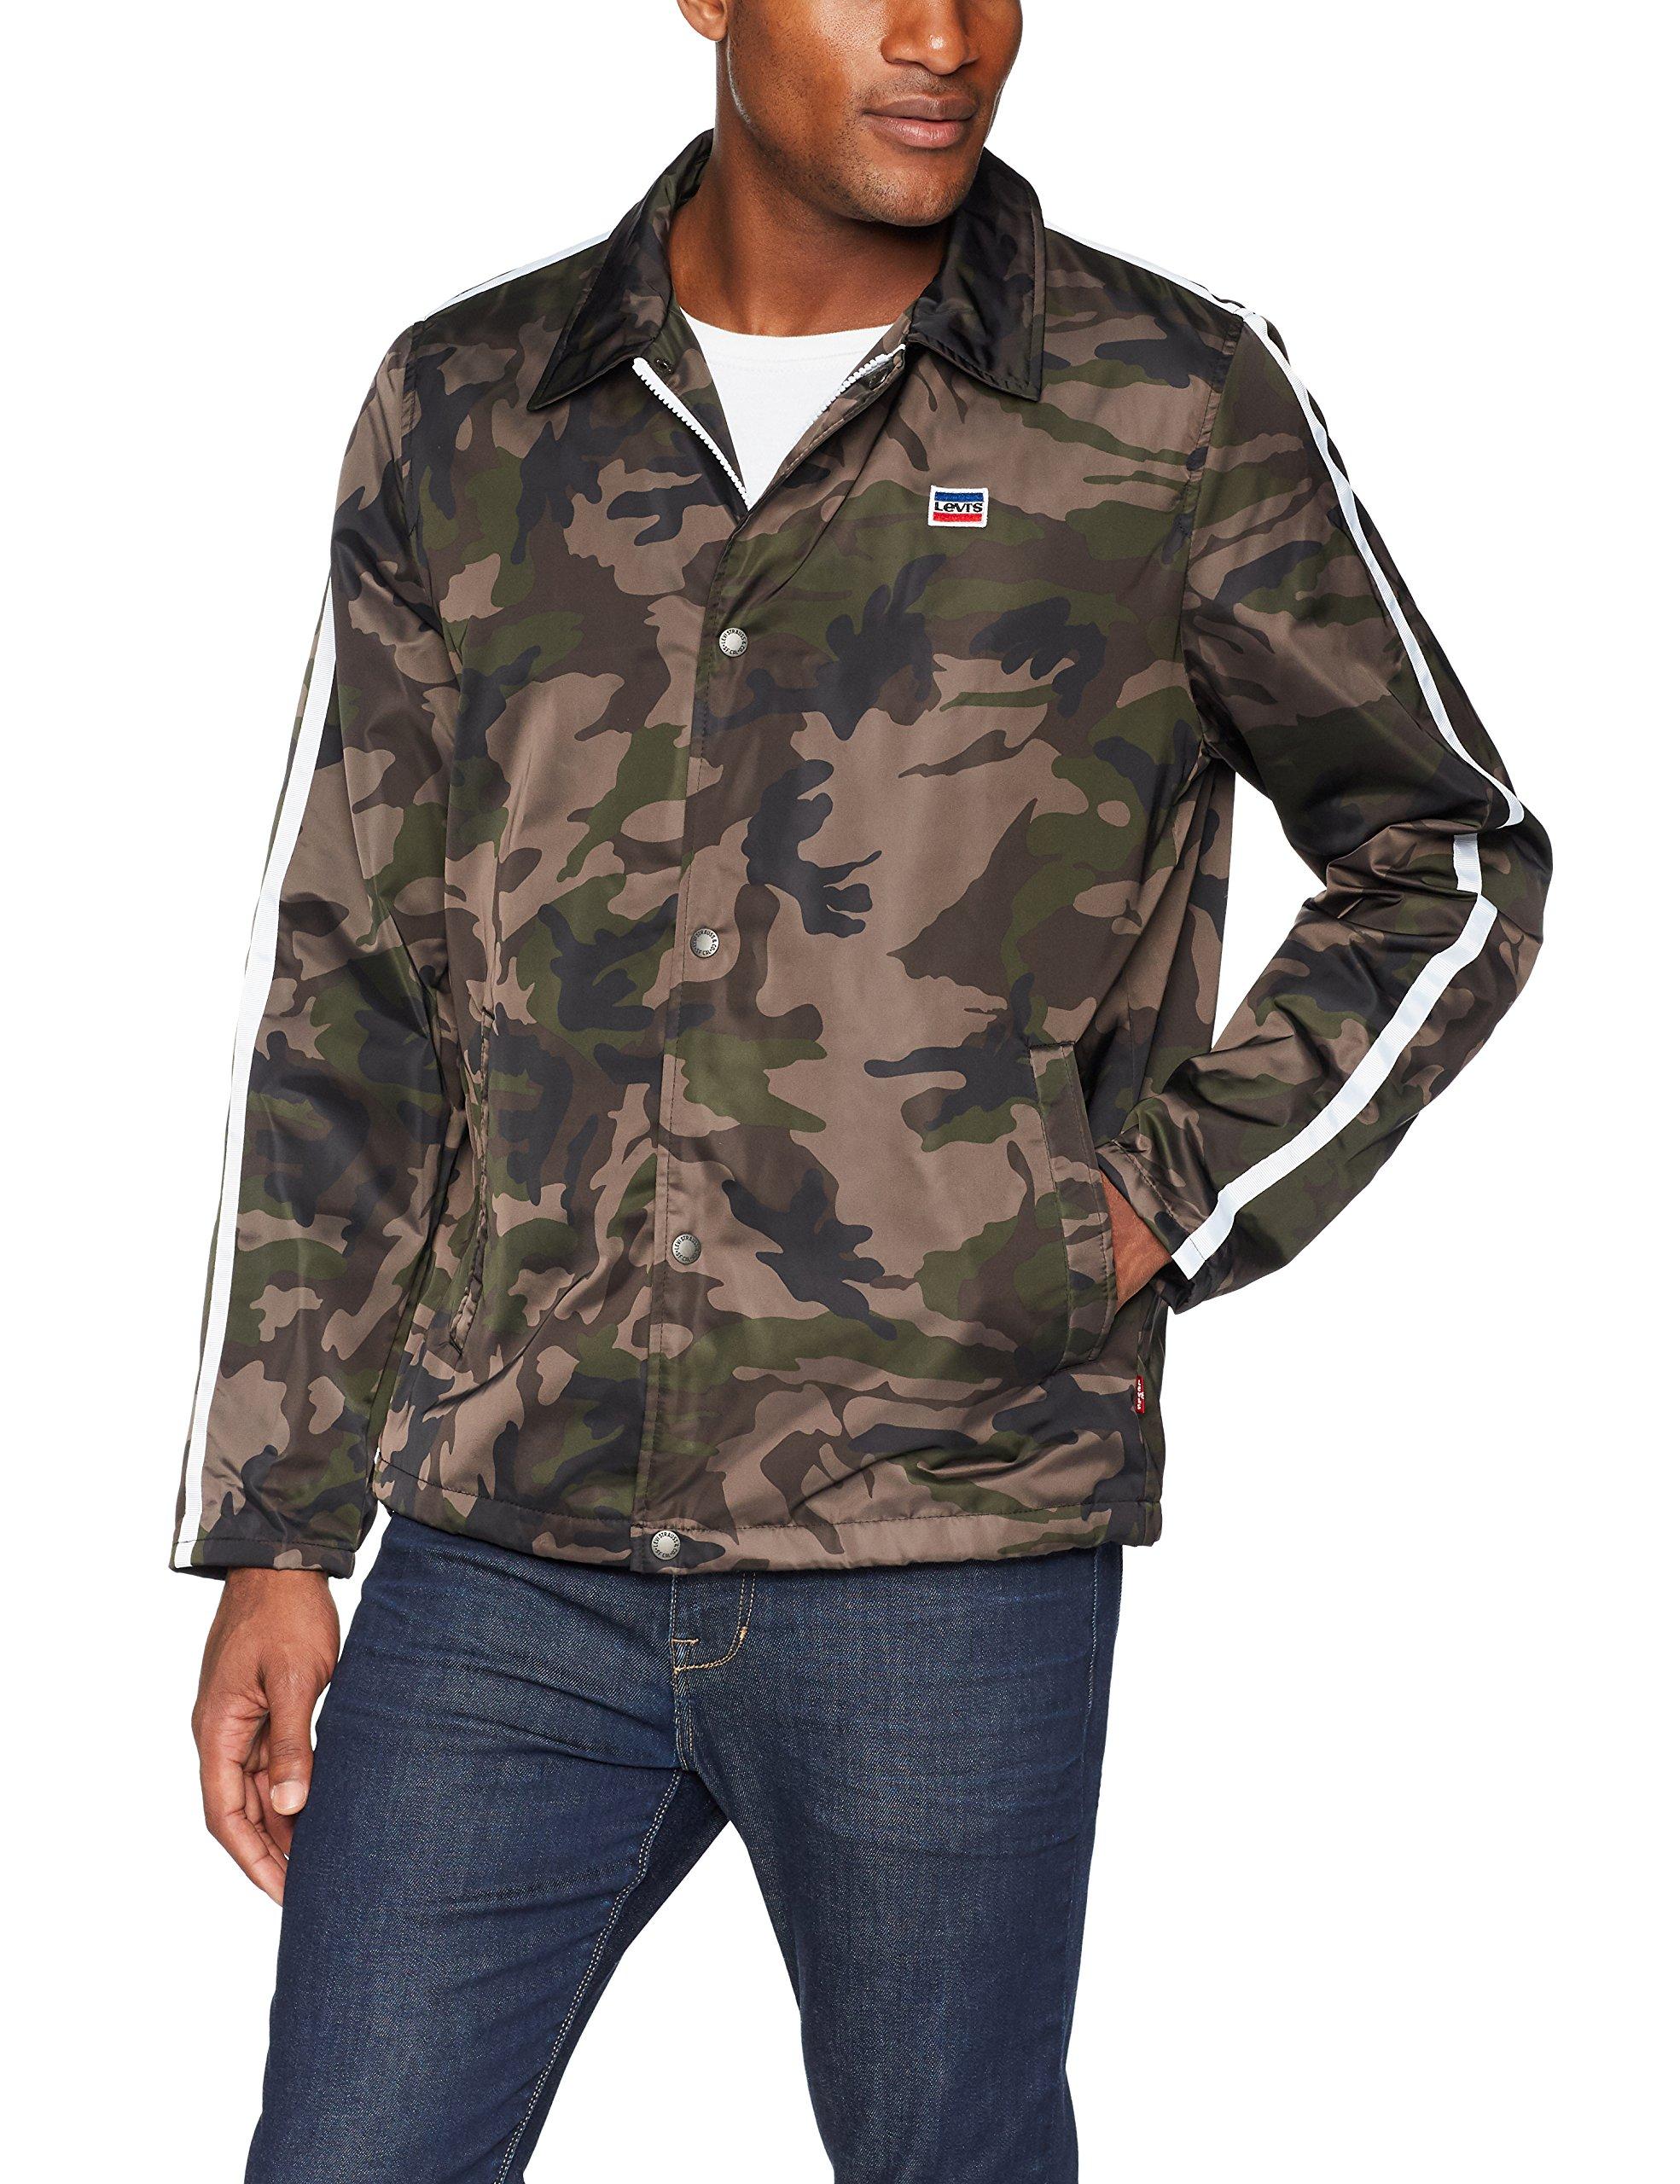 Levi's Men's Retro Coaches Jacket, Camouflage, Large by Levi's